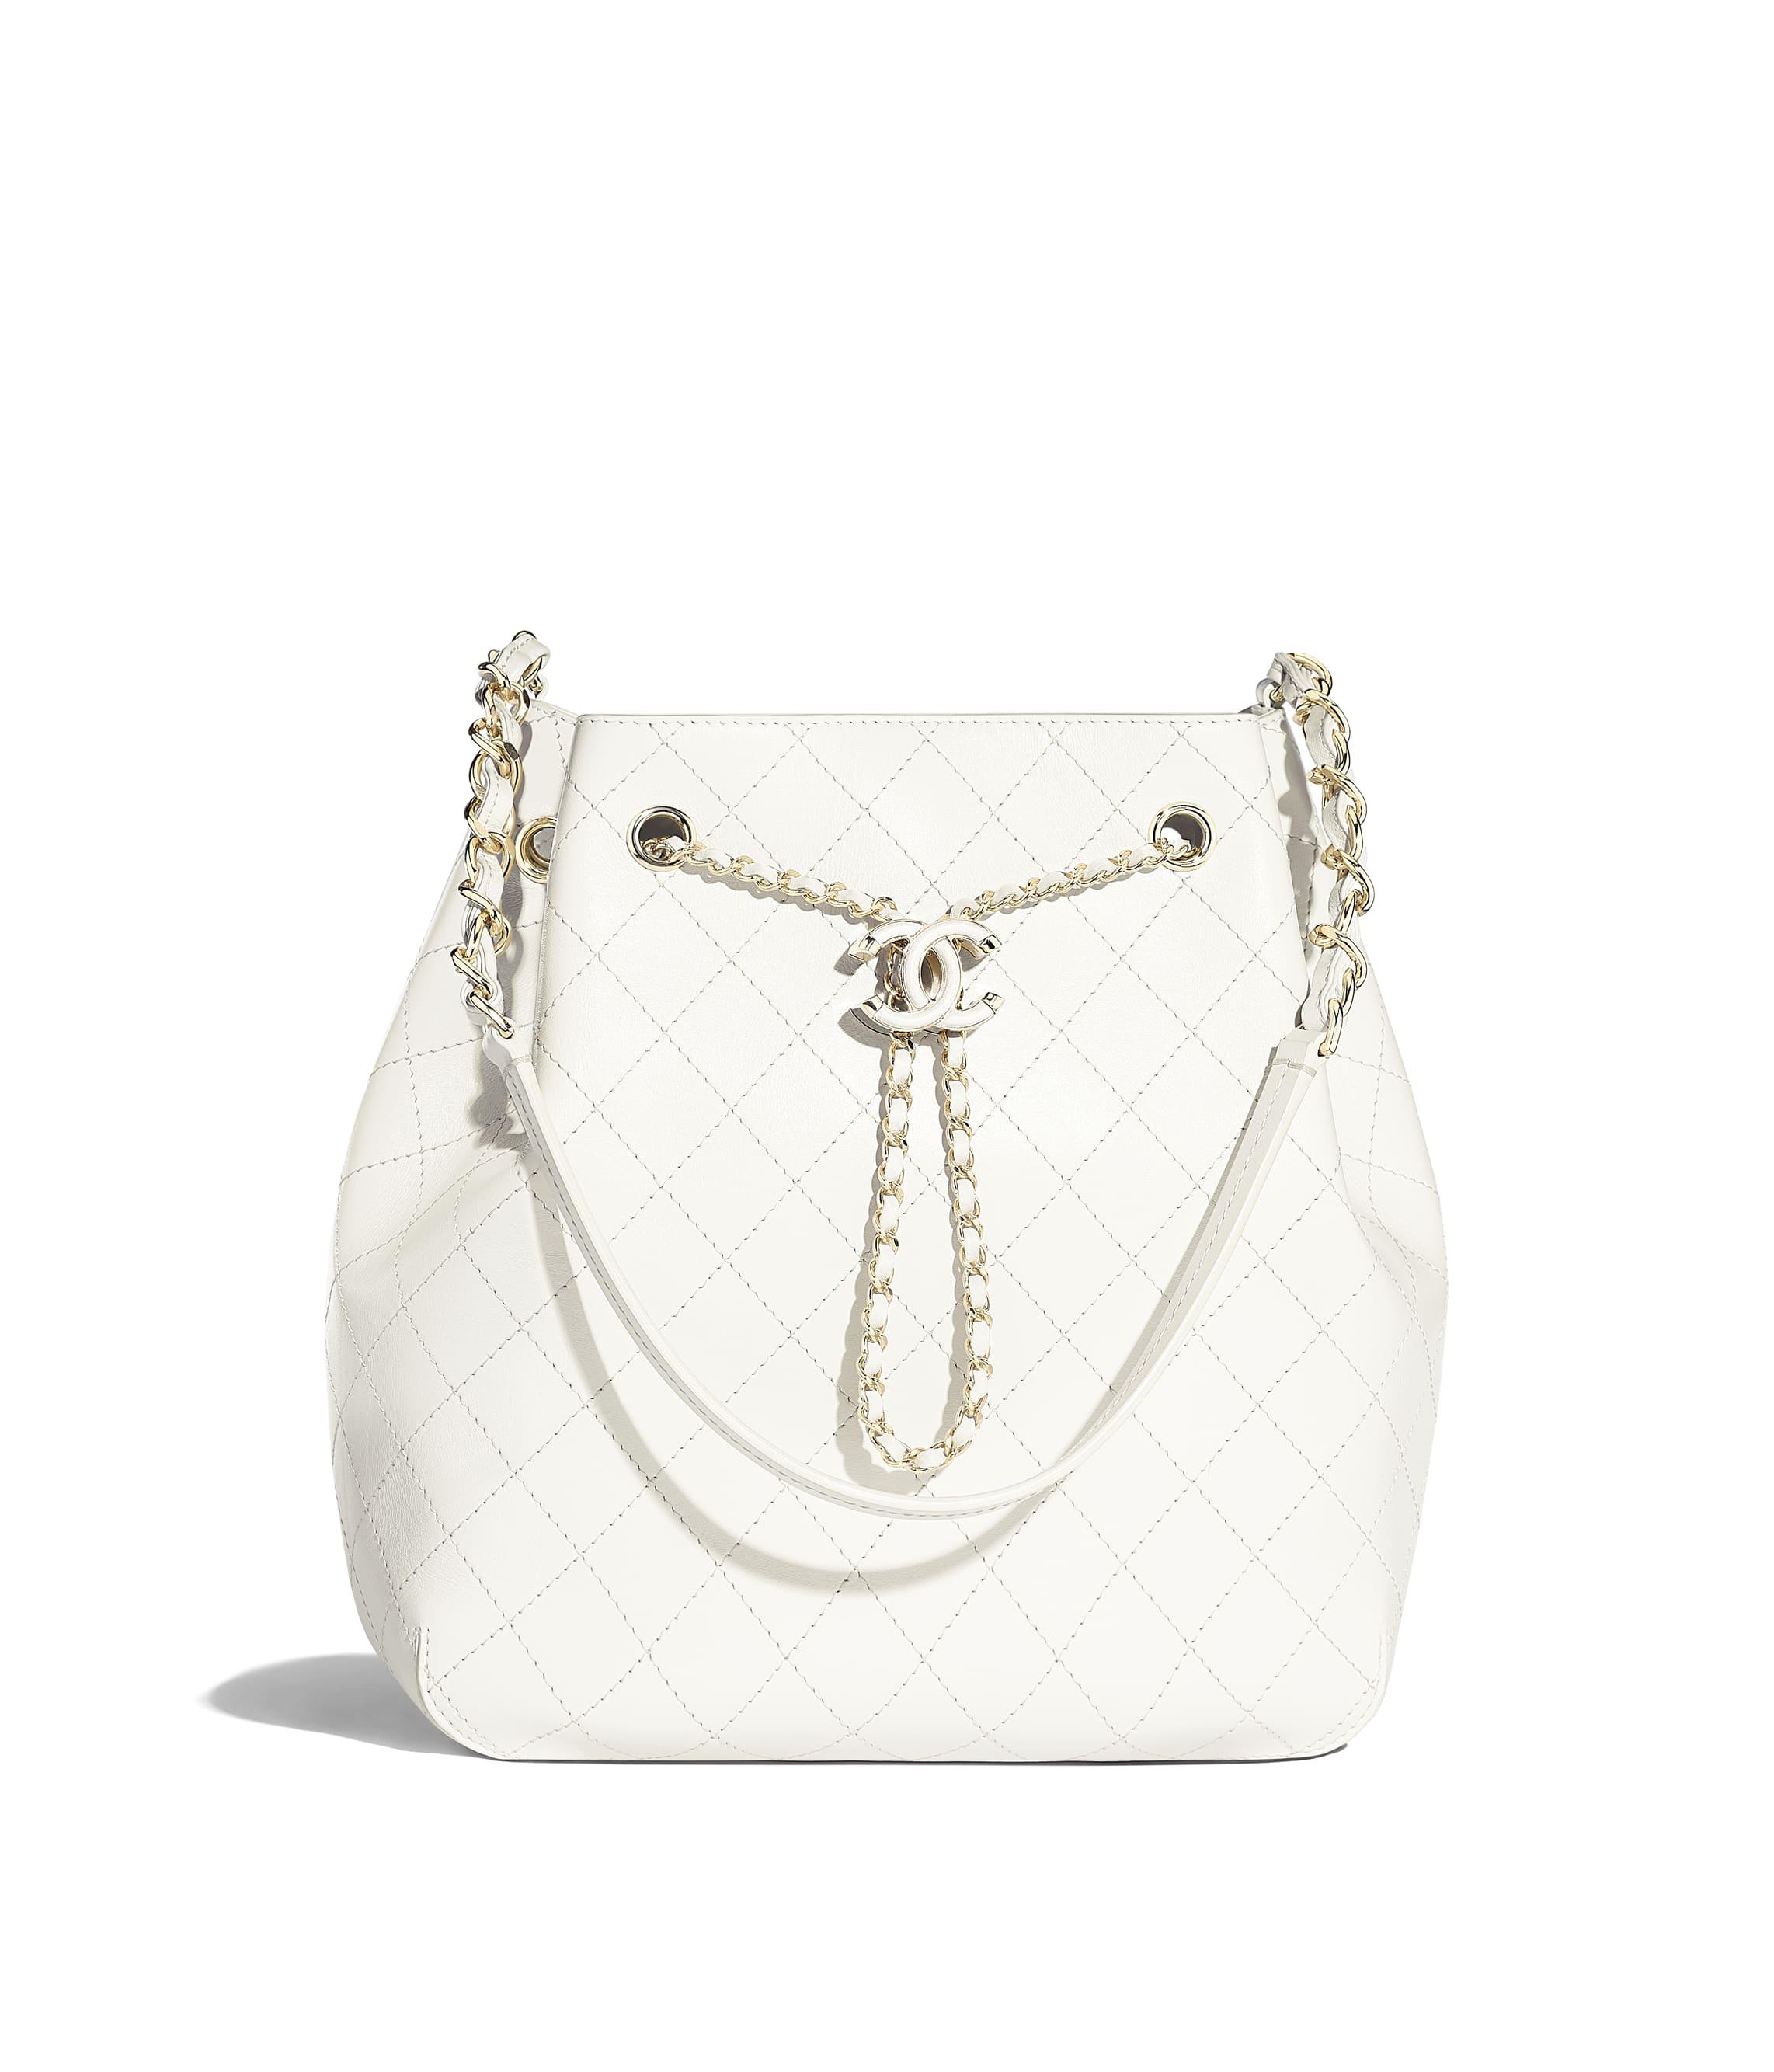 3f959d9d608a Drawstring Bag, calfskin & gold-tone metal, white - CHANEL